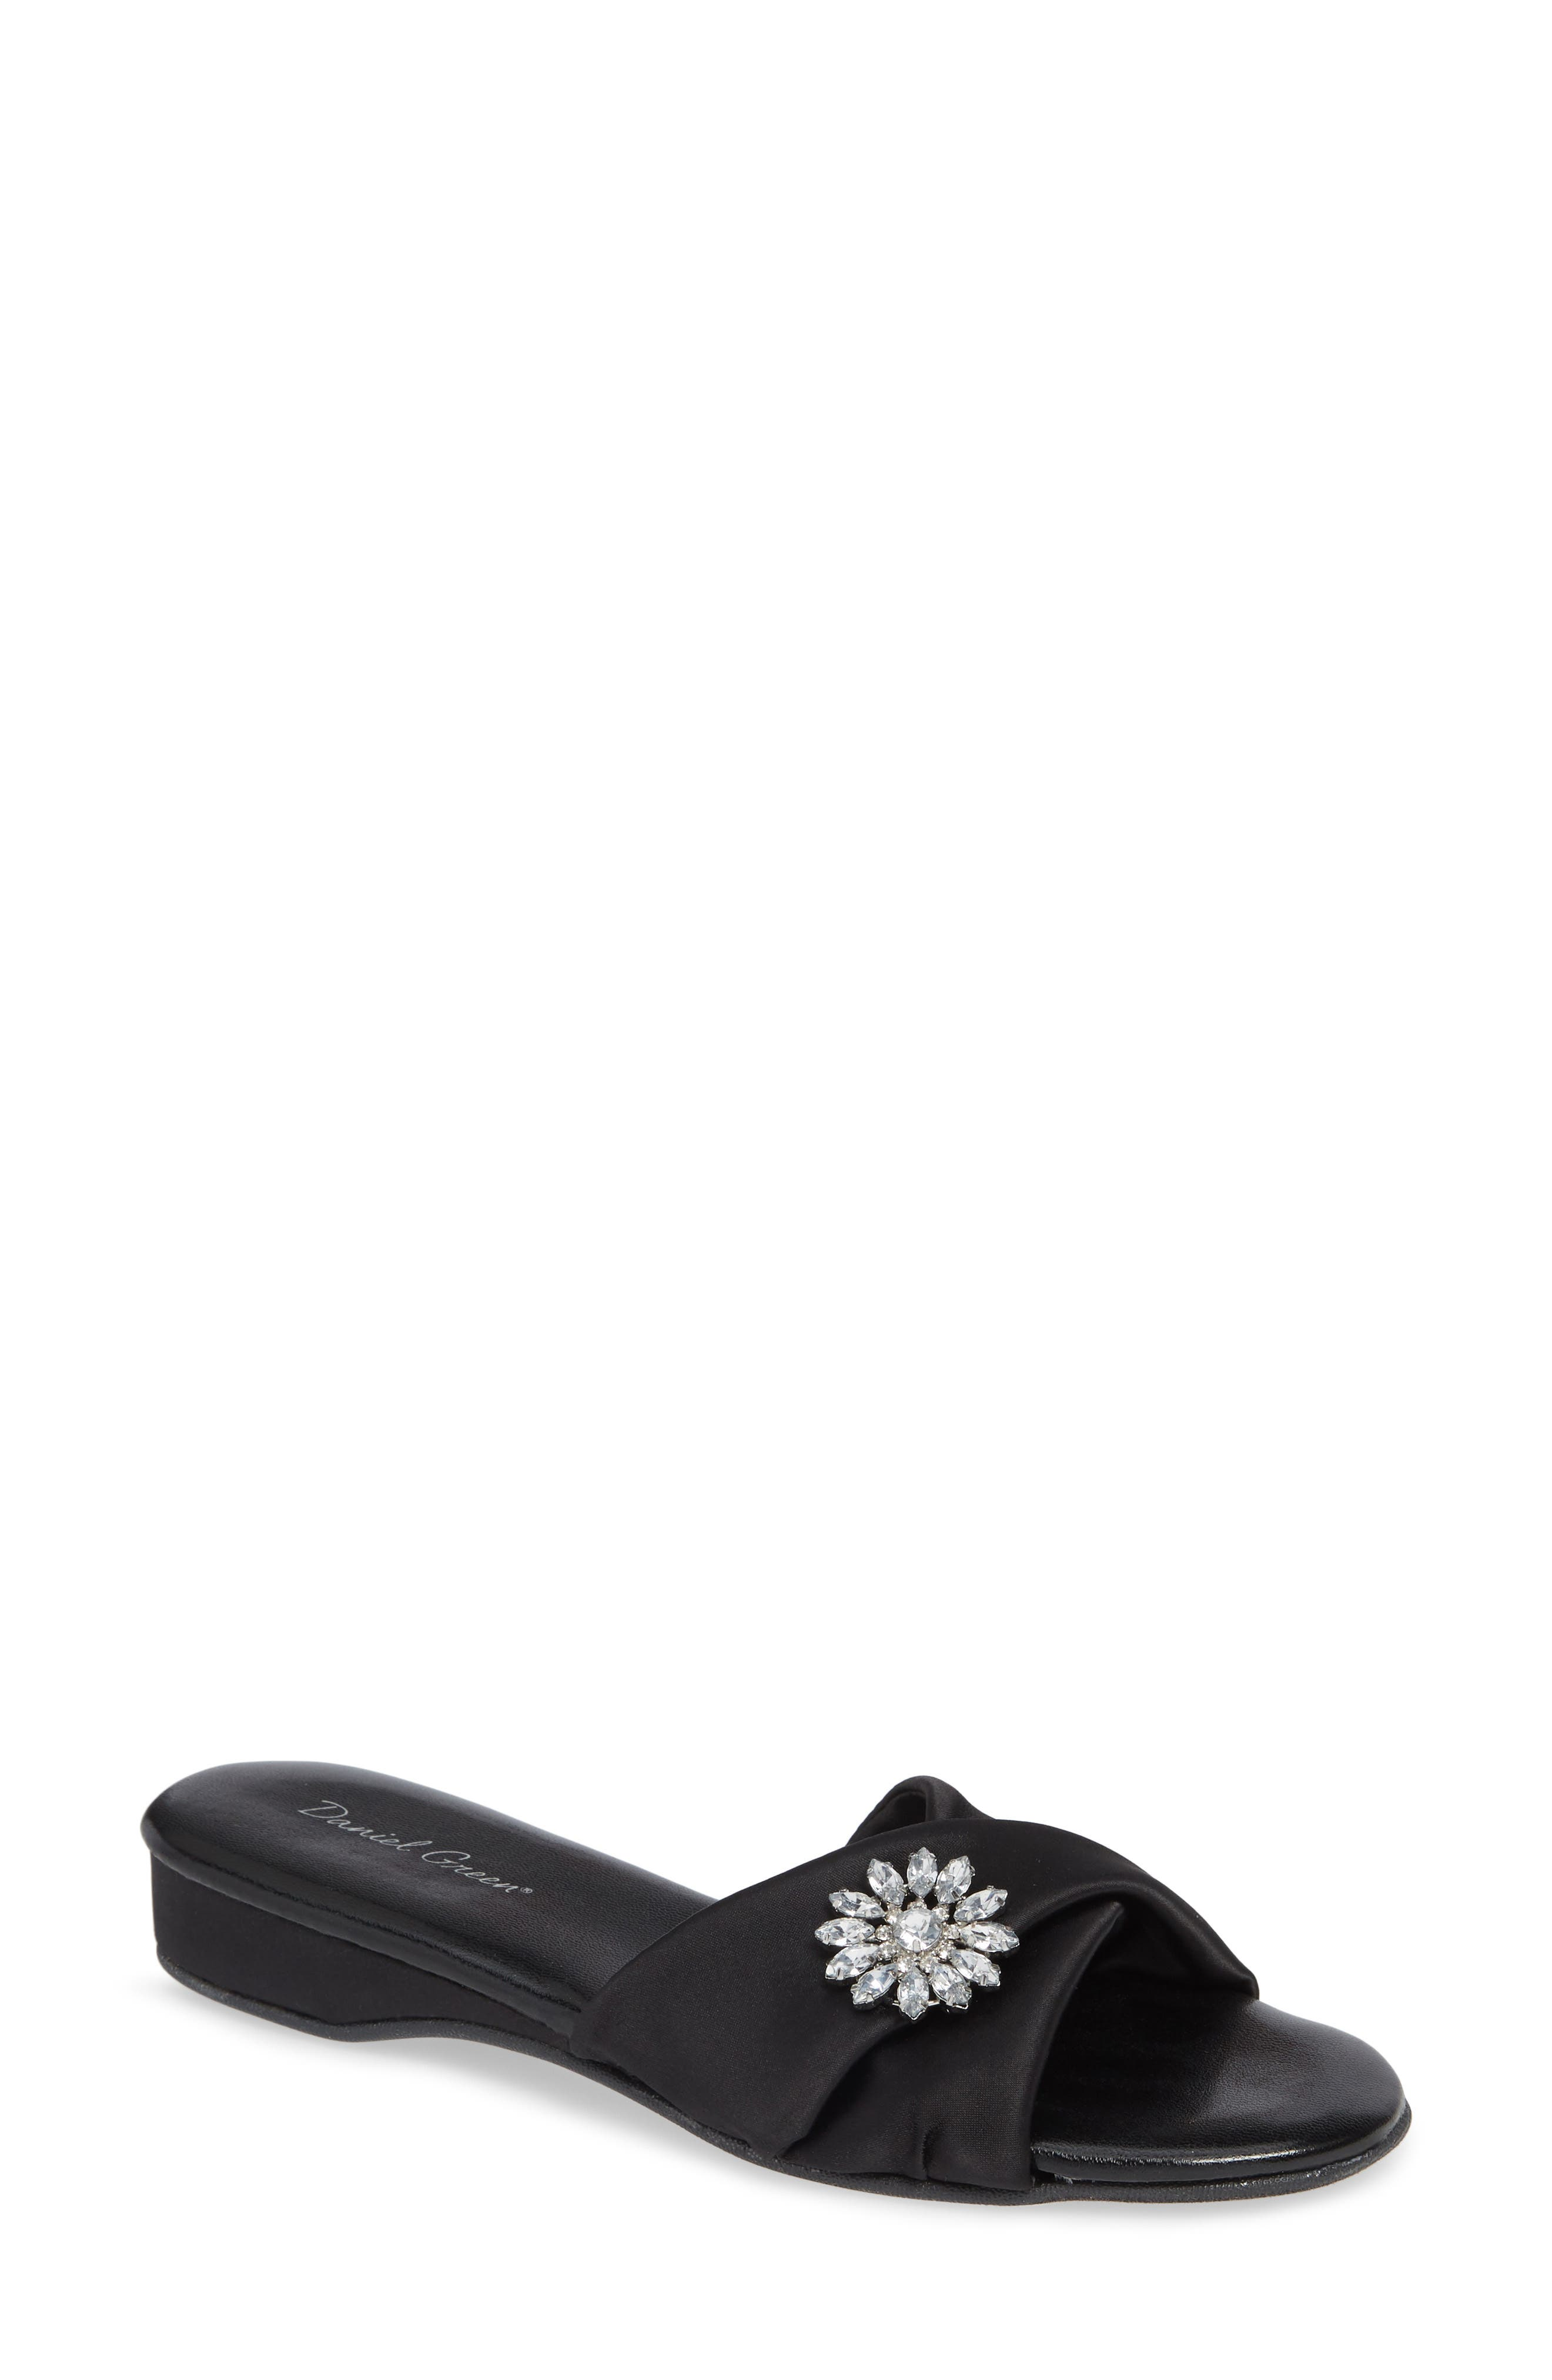 Dormie Twist Slide Sandal